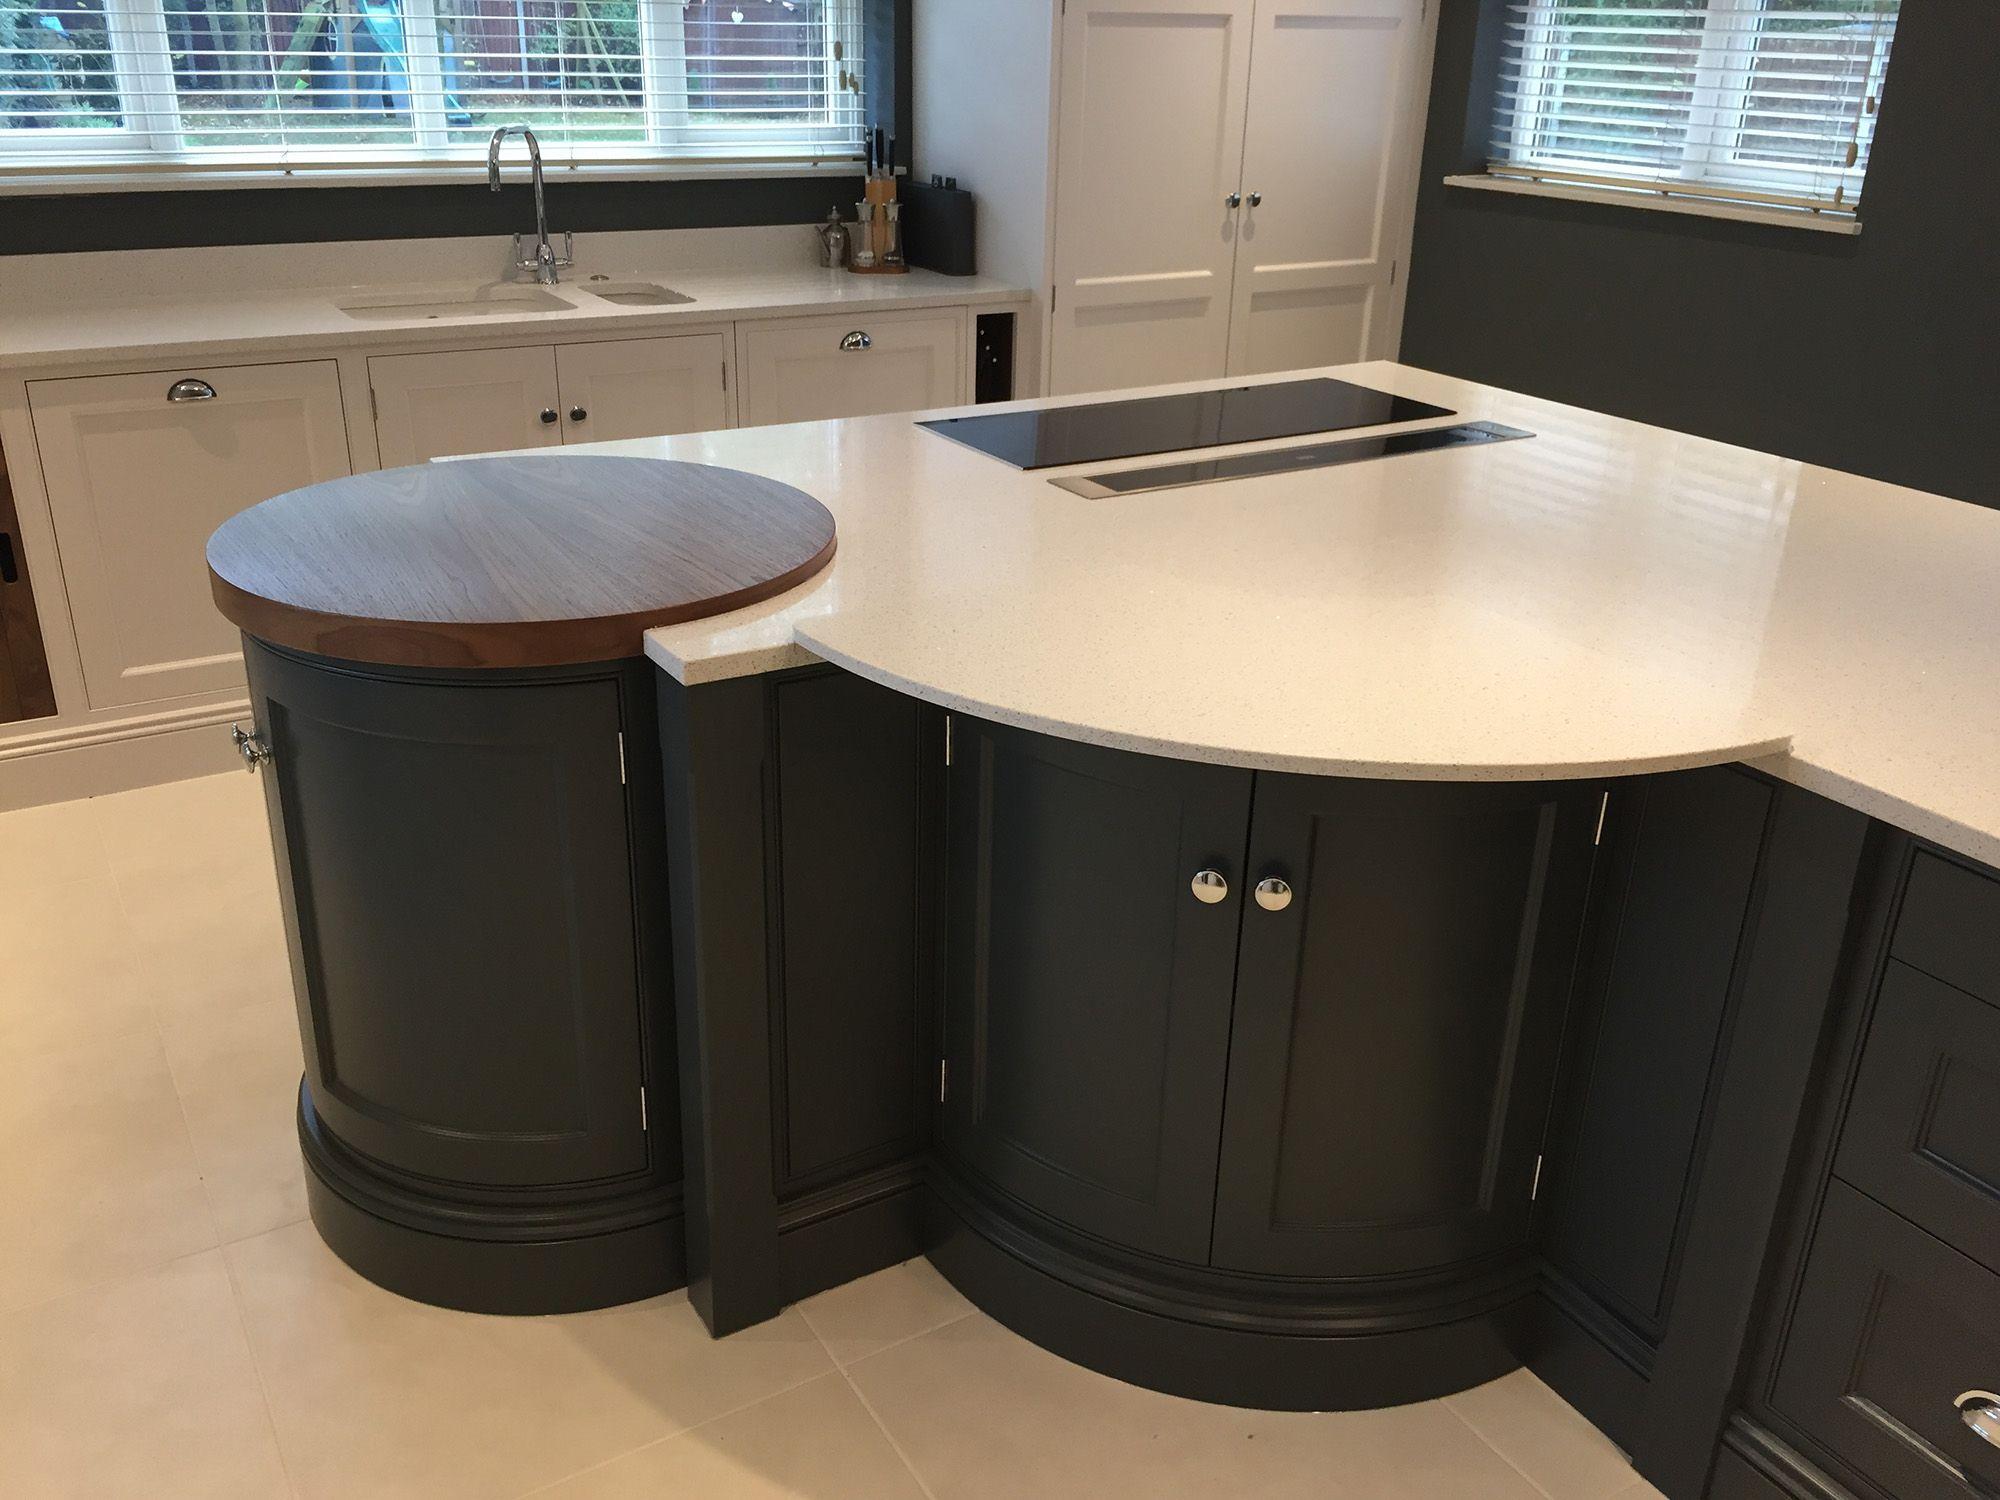 Kitchen gallery david barham furniture choosing proper colour